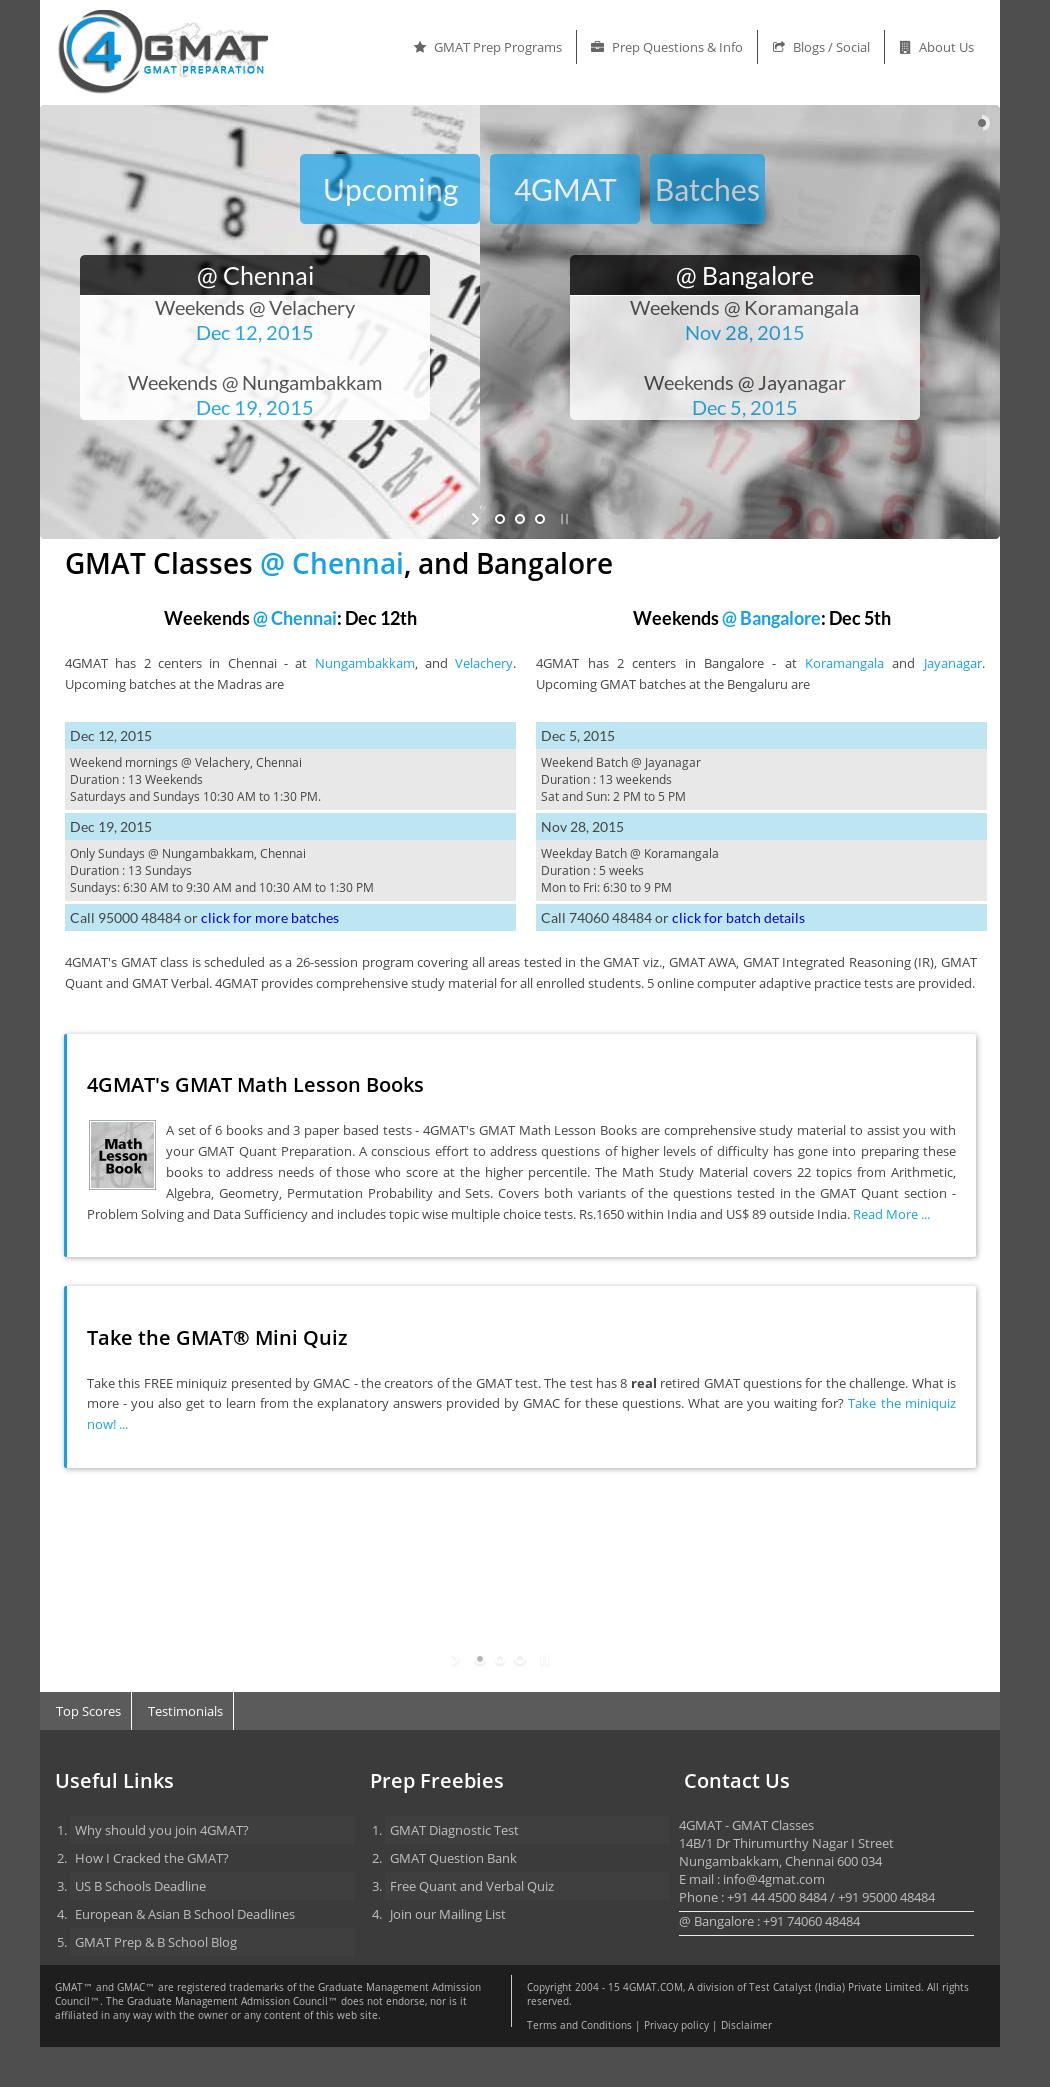 4gmat Gmat Classes, Preparation, Ebooks Competitors, Revenue